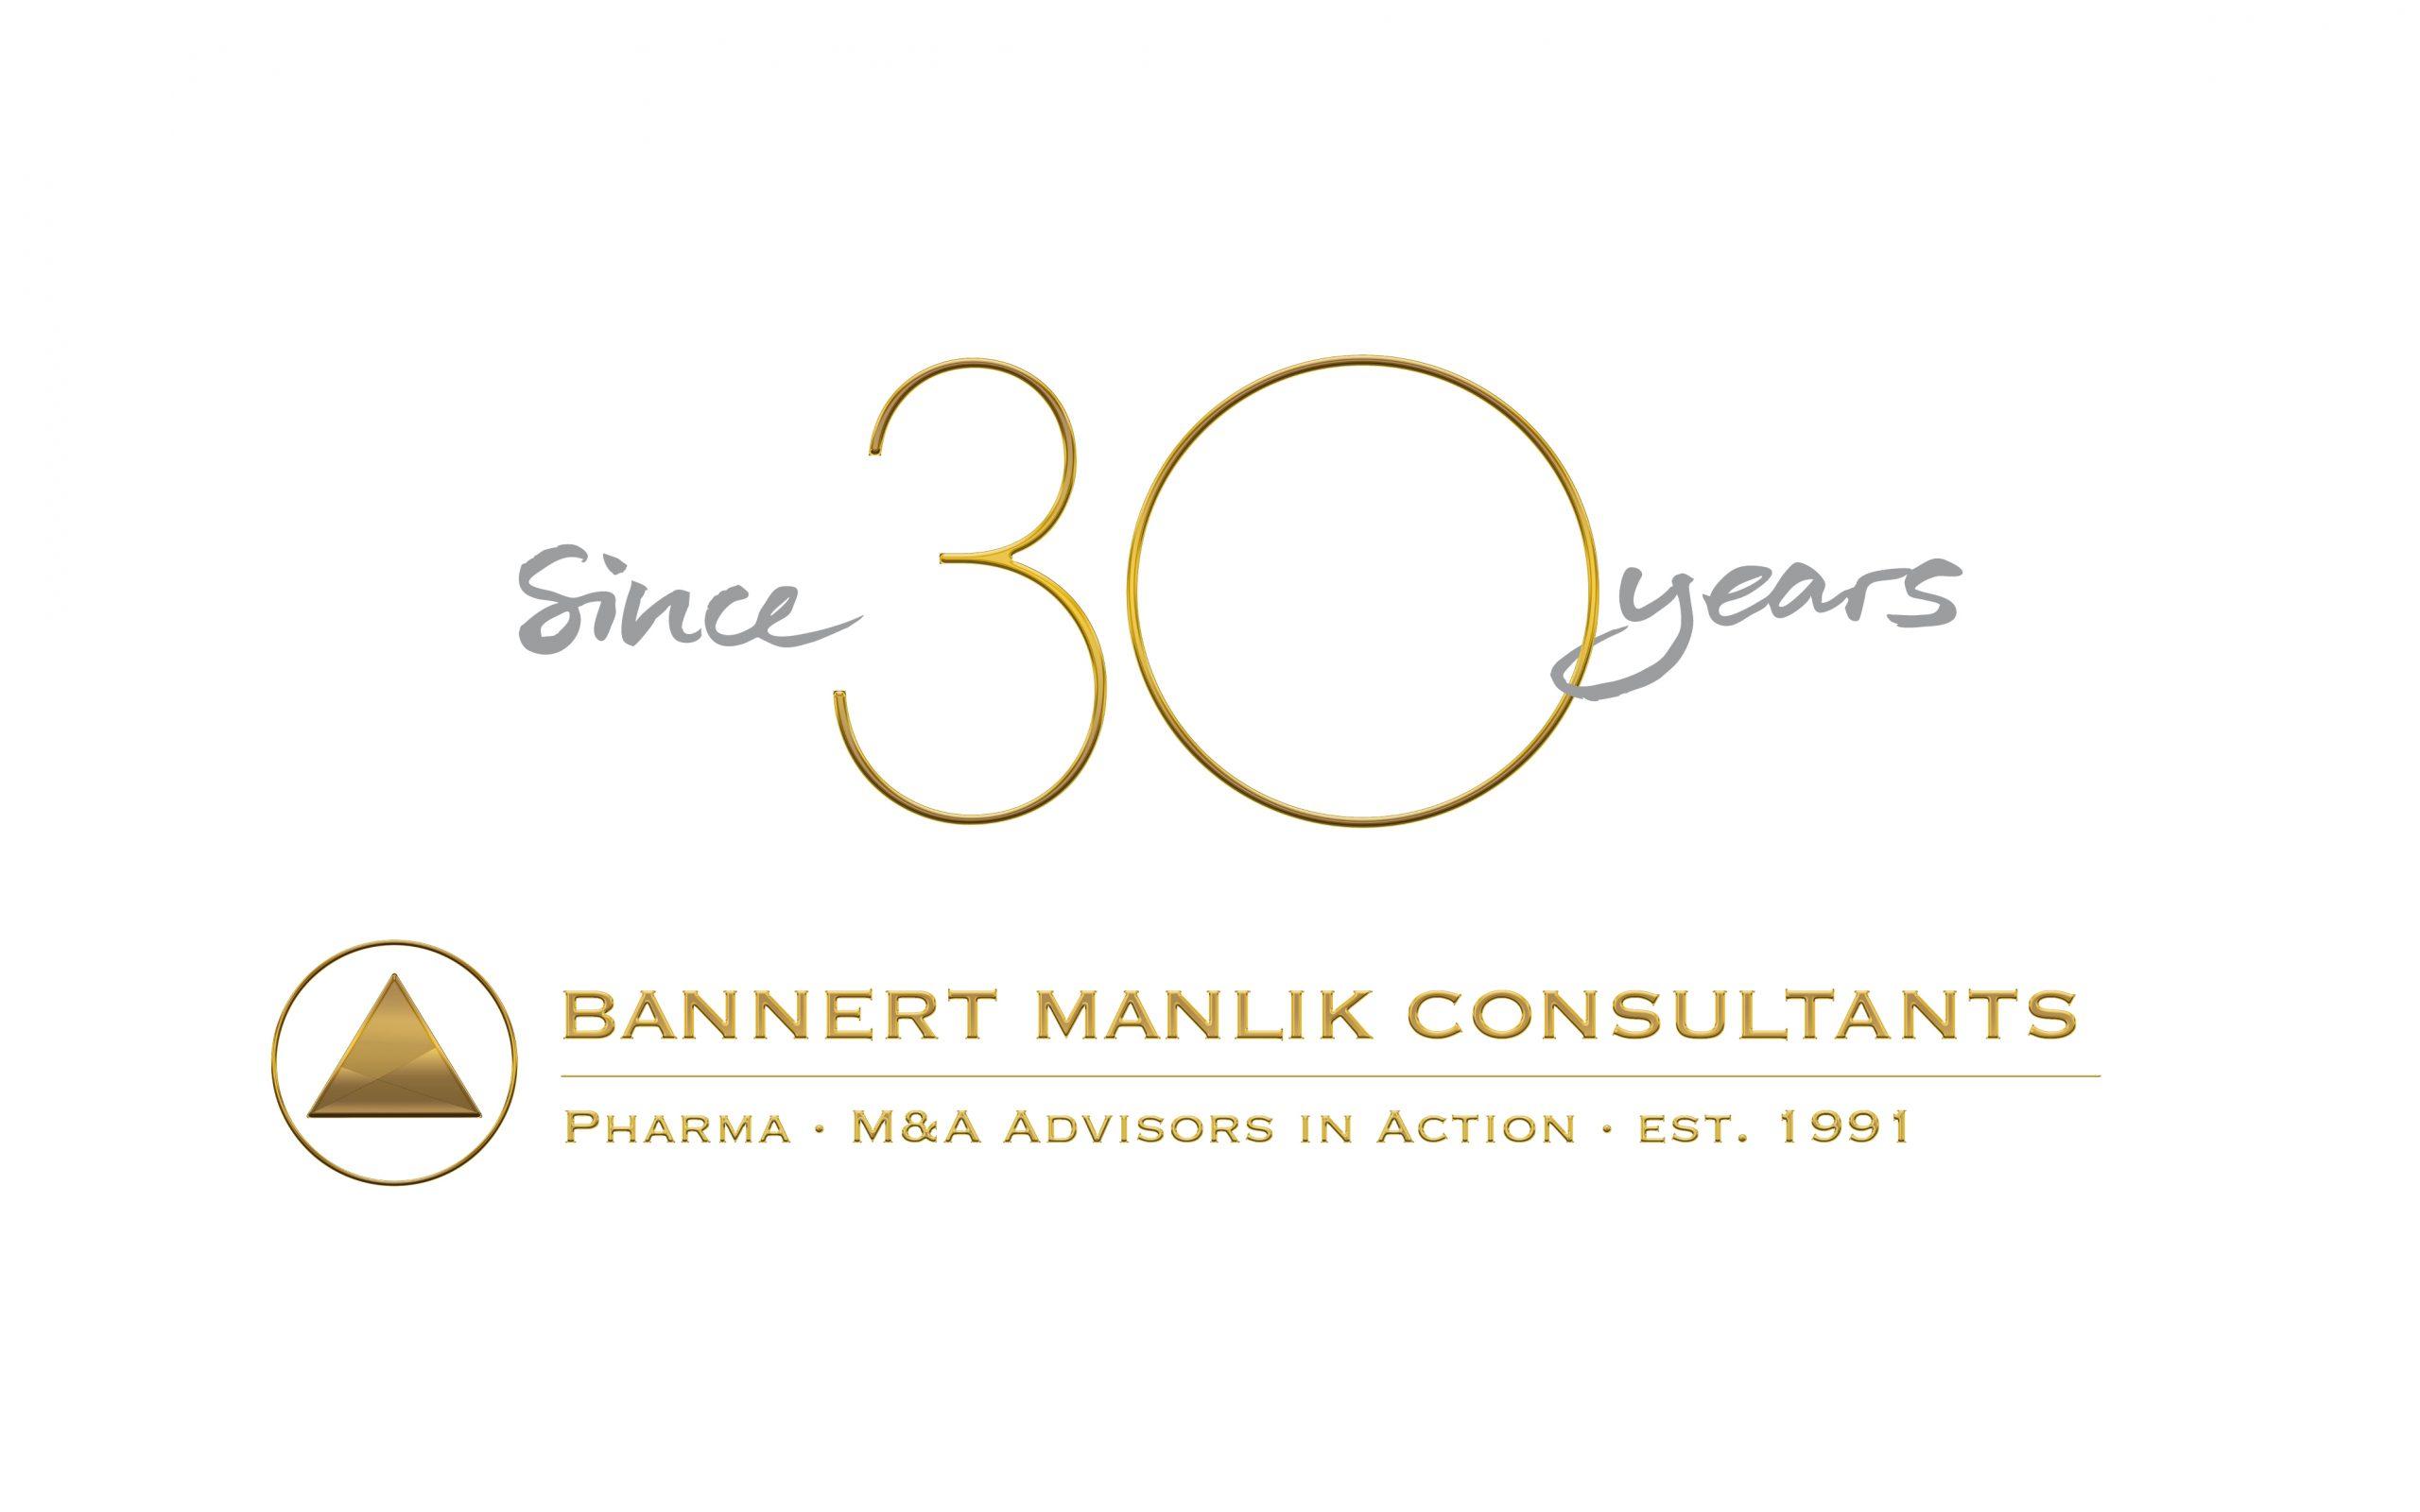 since 30 years Bannert Manlik